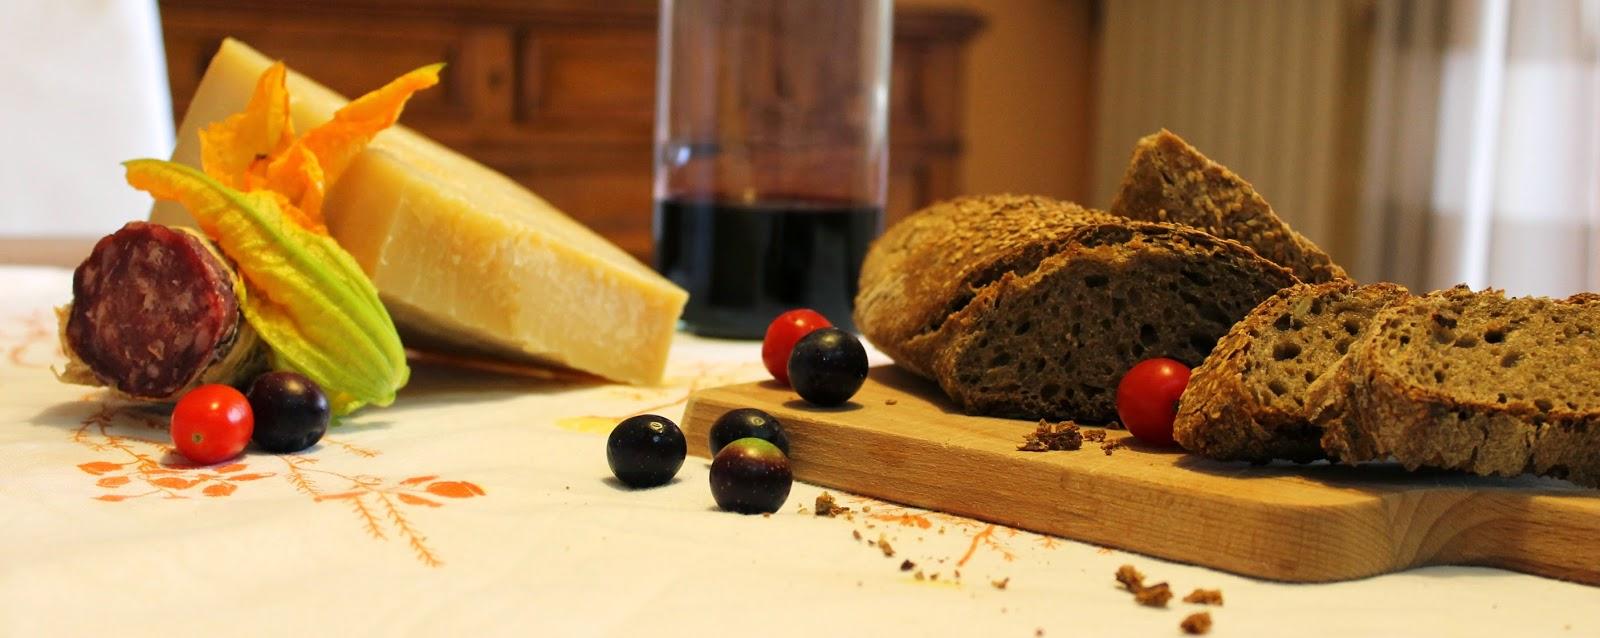 Pane ai sette cereali e sesamo